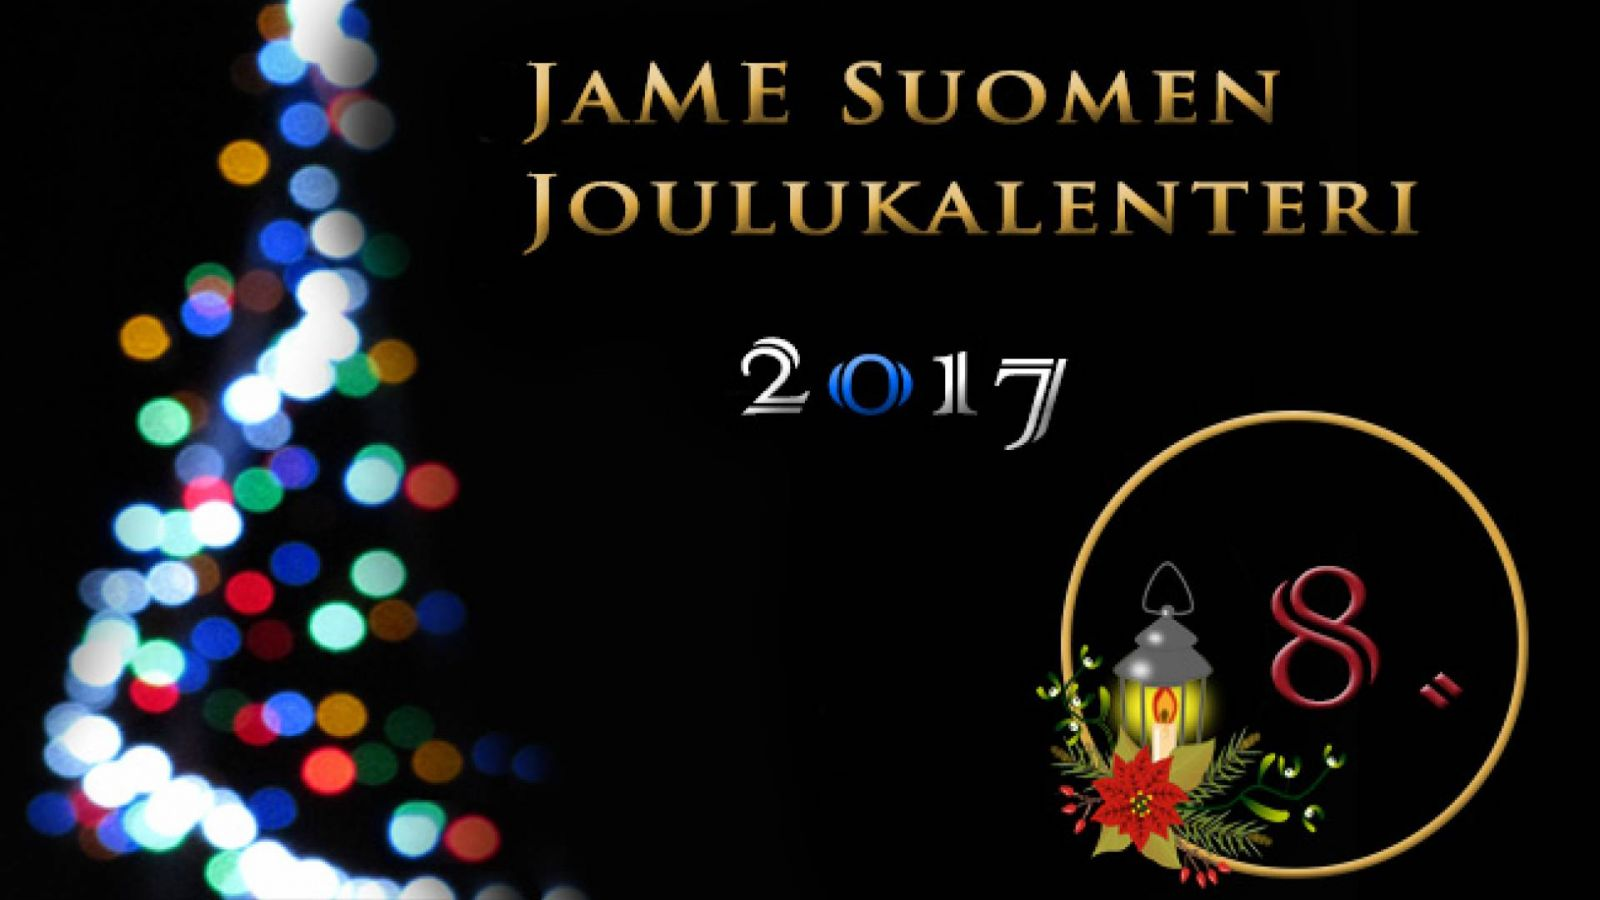 JaME Suomen joulukalenterin 8. luukku © Nipsu